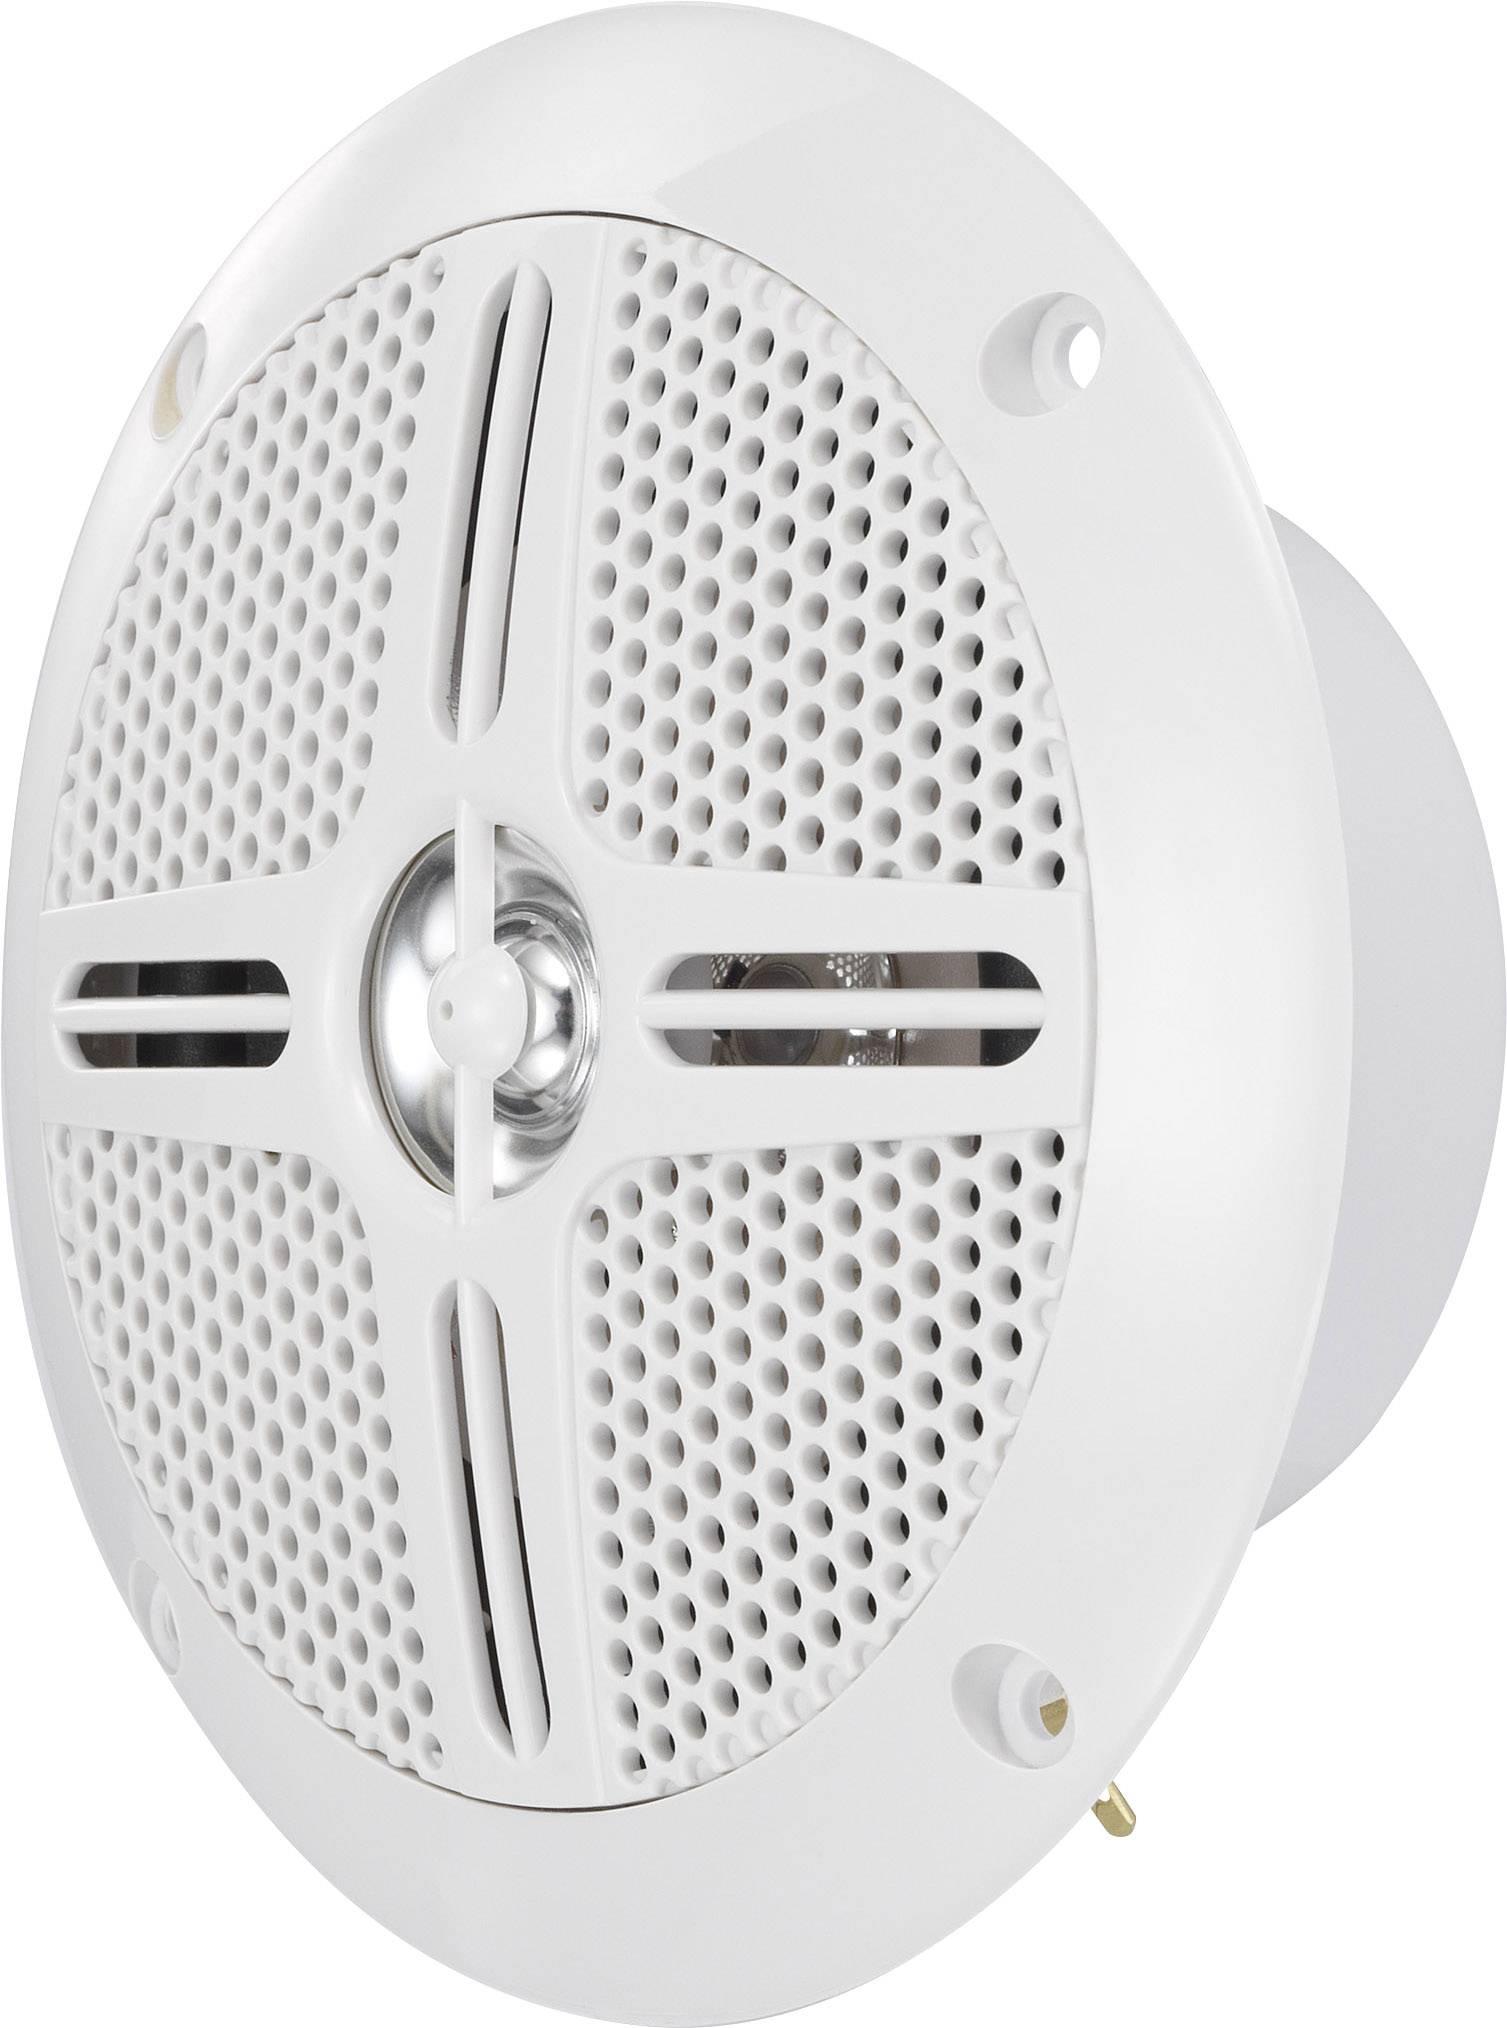 Vstavaný reproduktor RENKFORCE 40 W, 4 Ω, biela